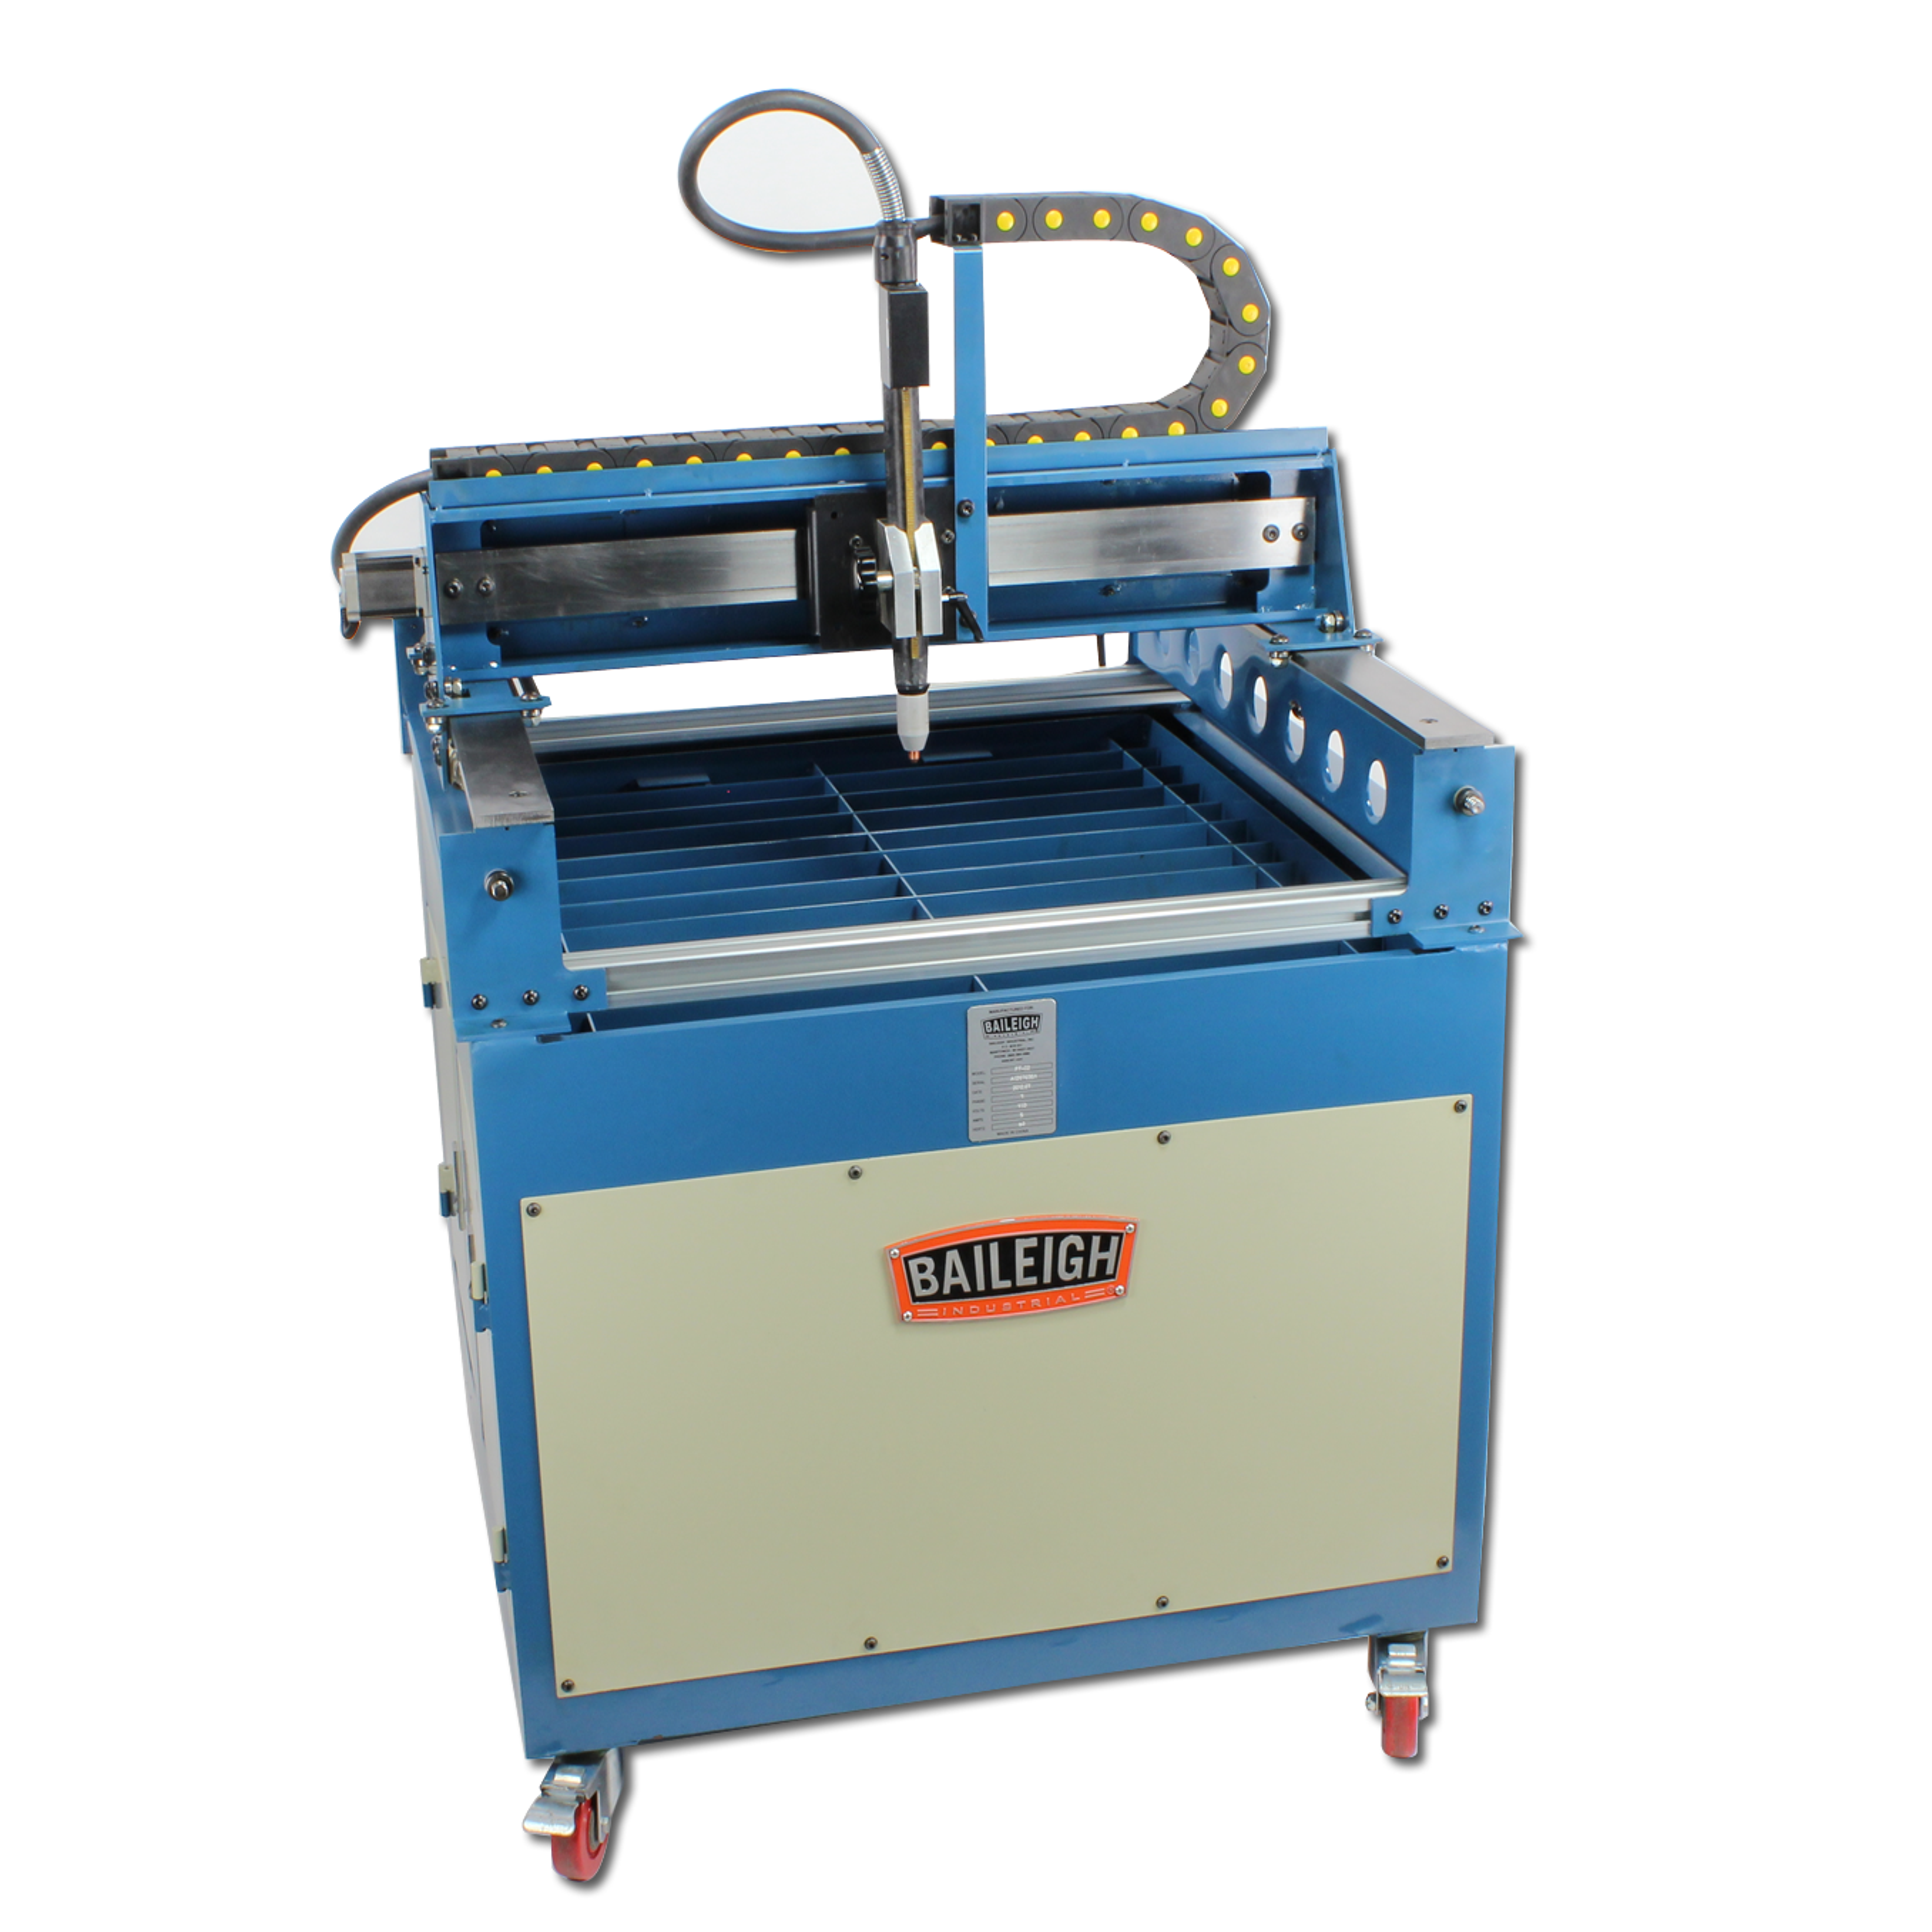 Spitfire CNC Plasma Cutter |Used Cnc Plasma Cutting Tables